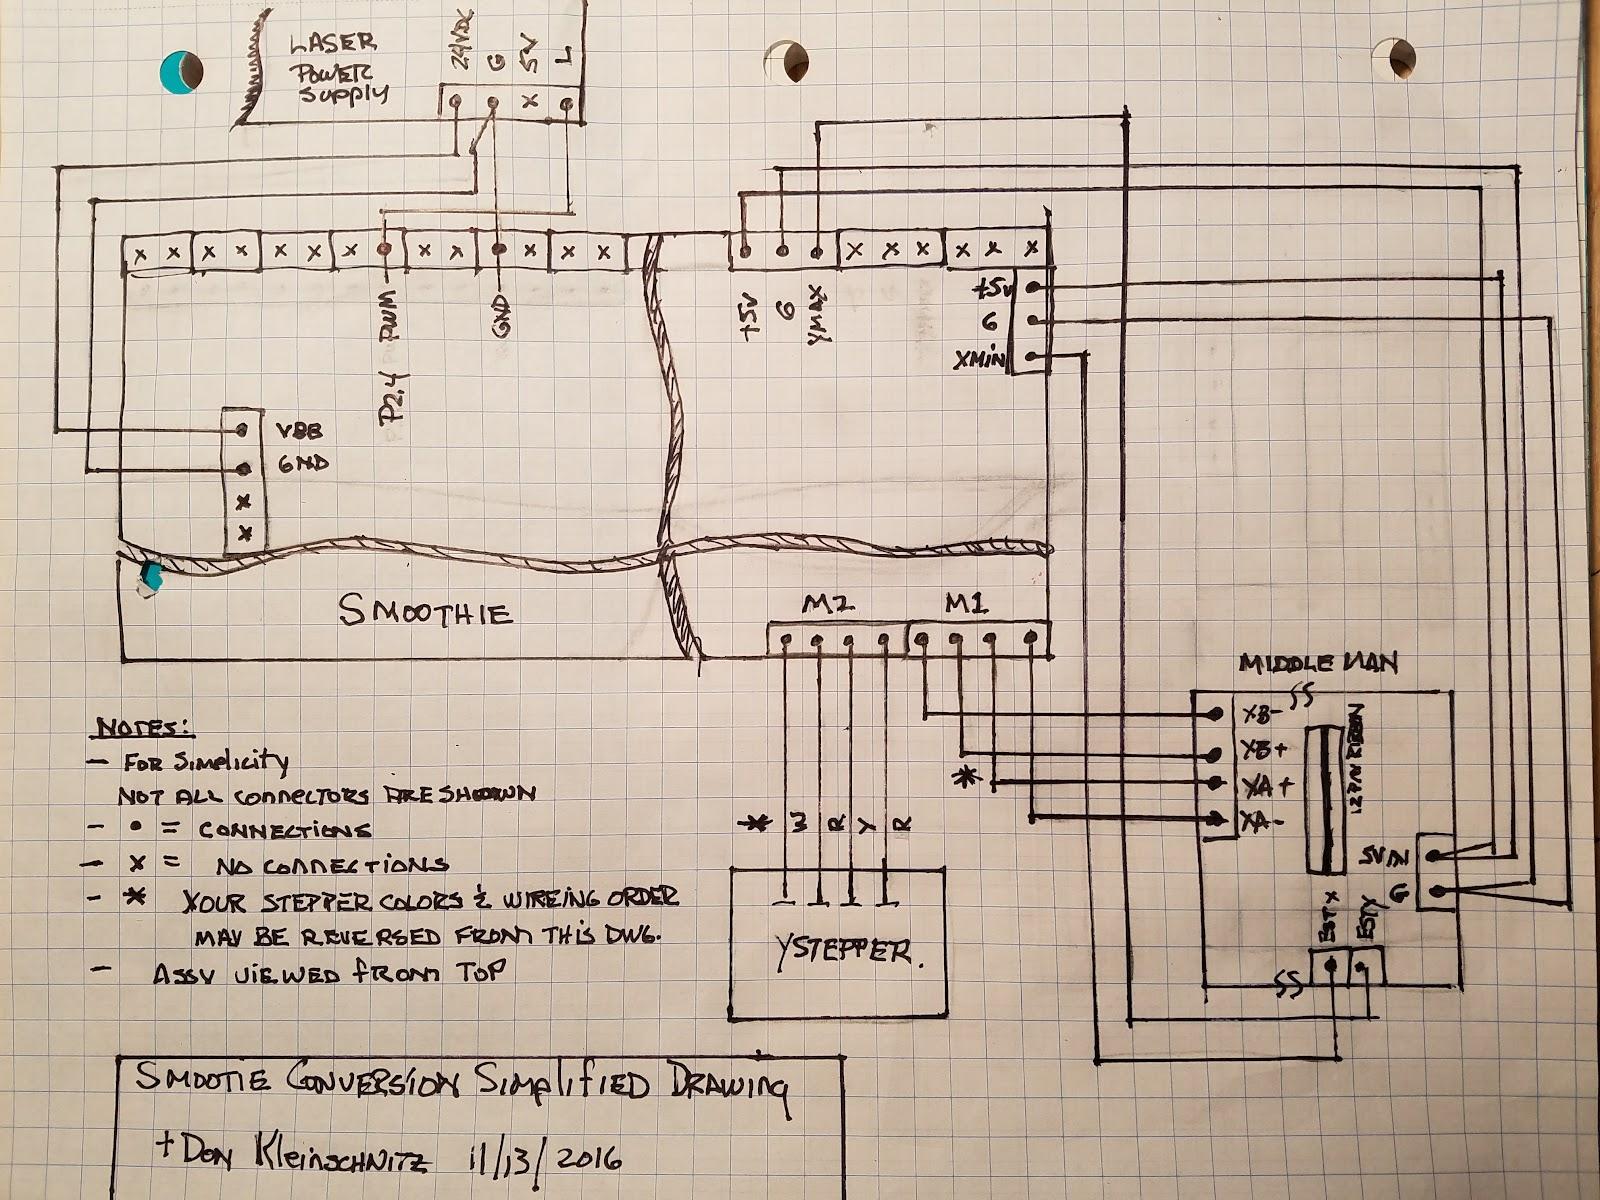 medium resolution of k40 fuse diagram wiring diagramk40 fuse diagram wiring diagram lapk40 fuse diagram wiring diagram database fuse